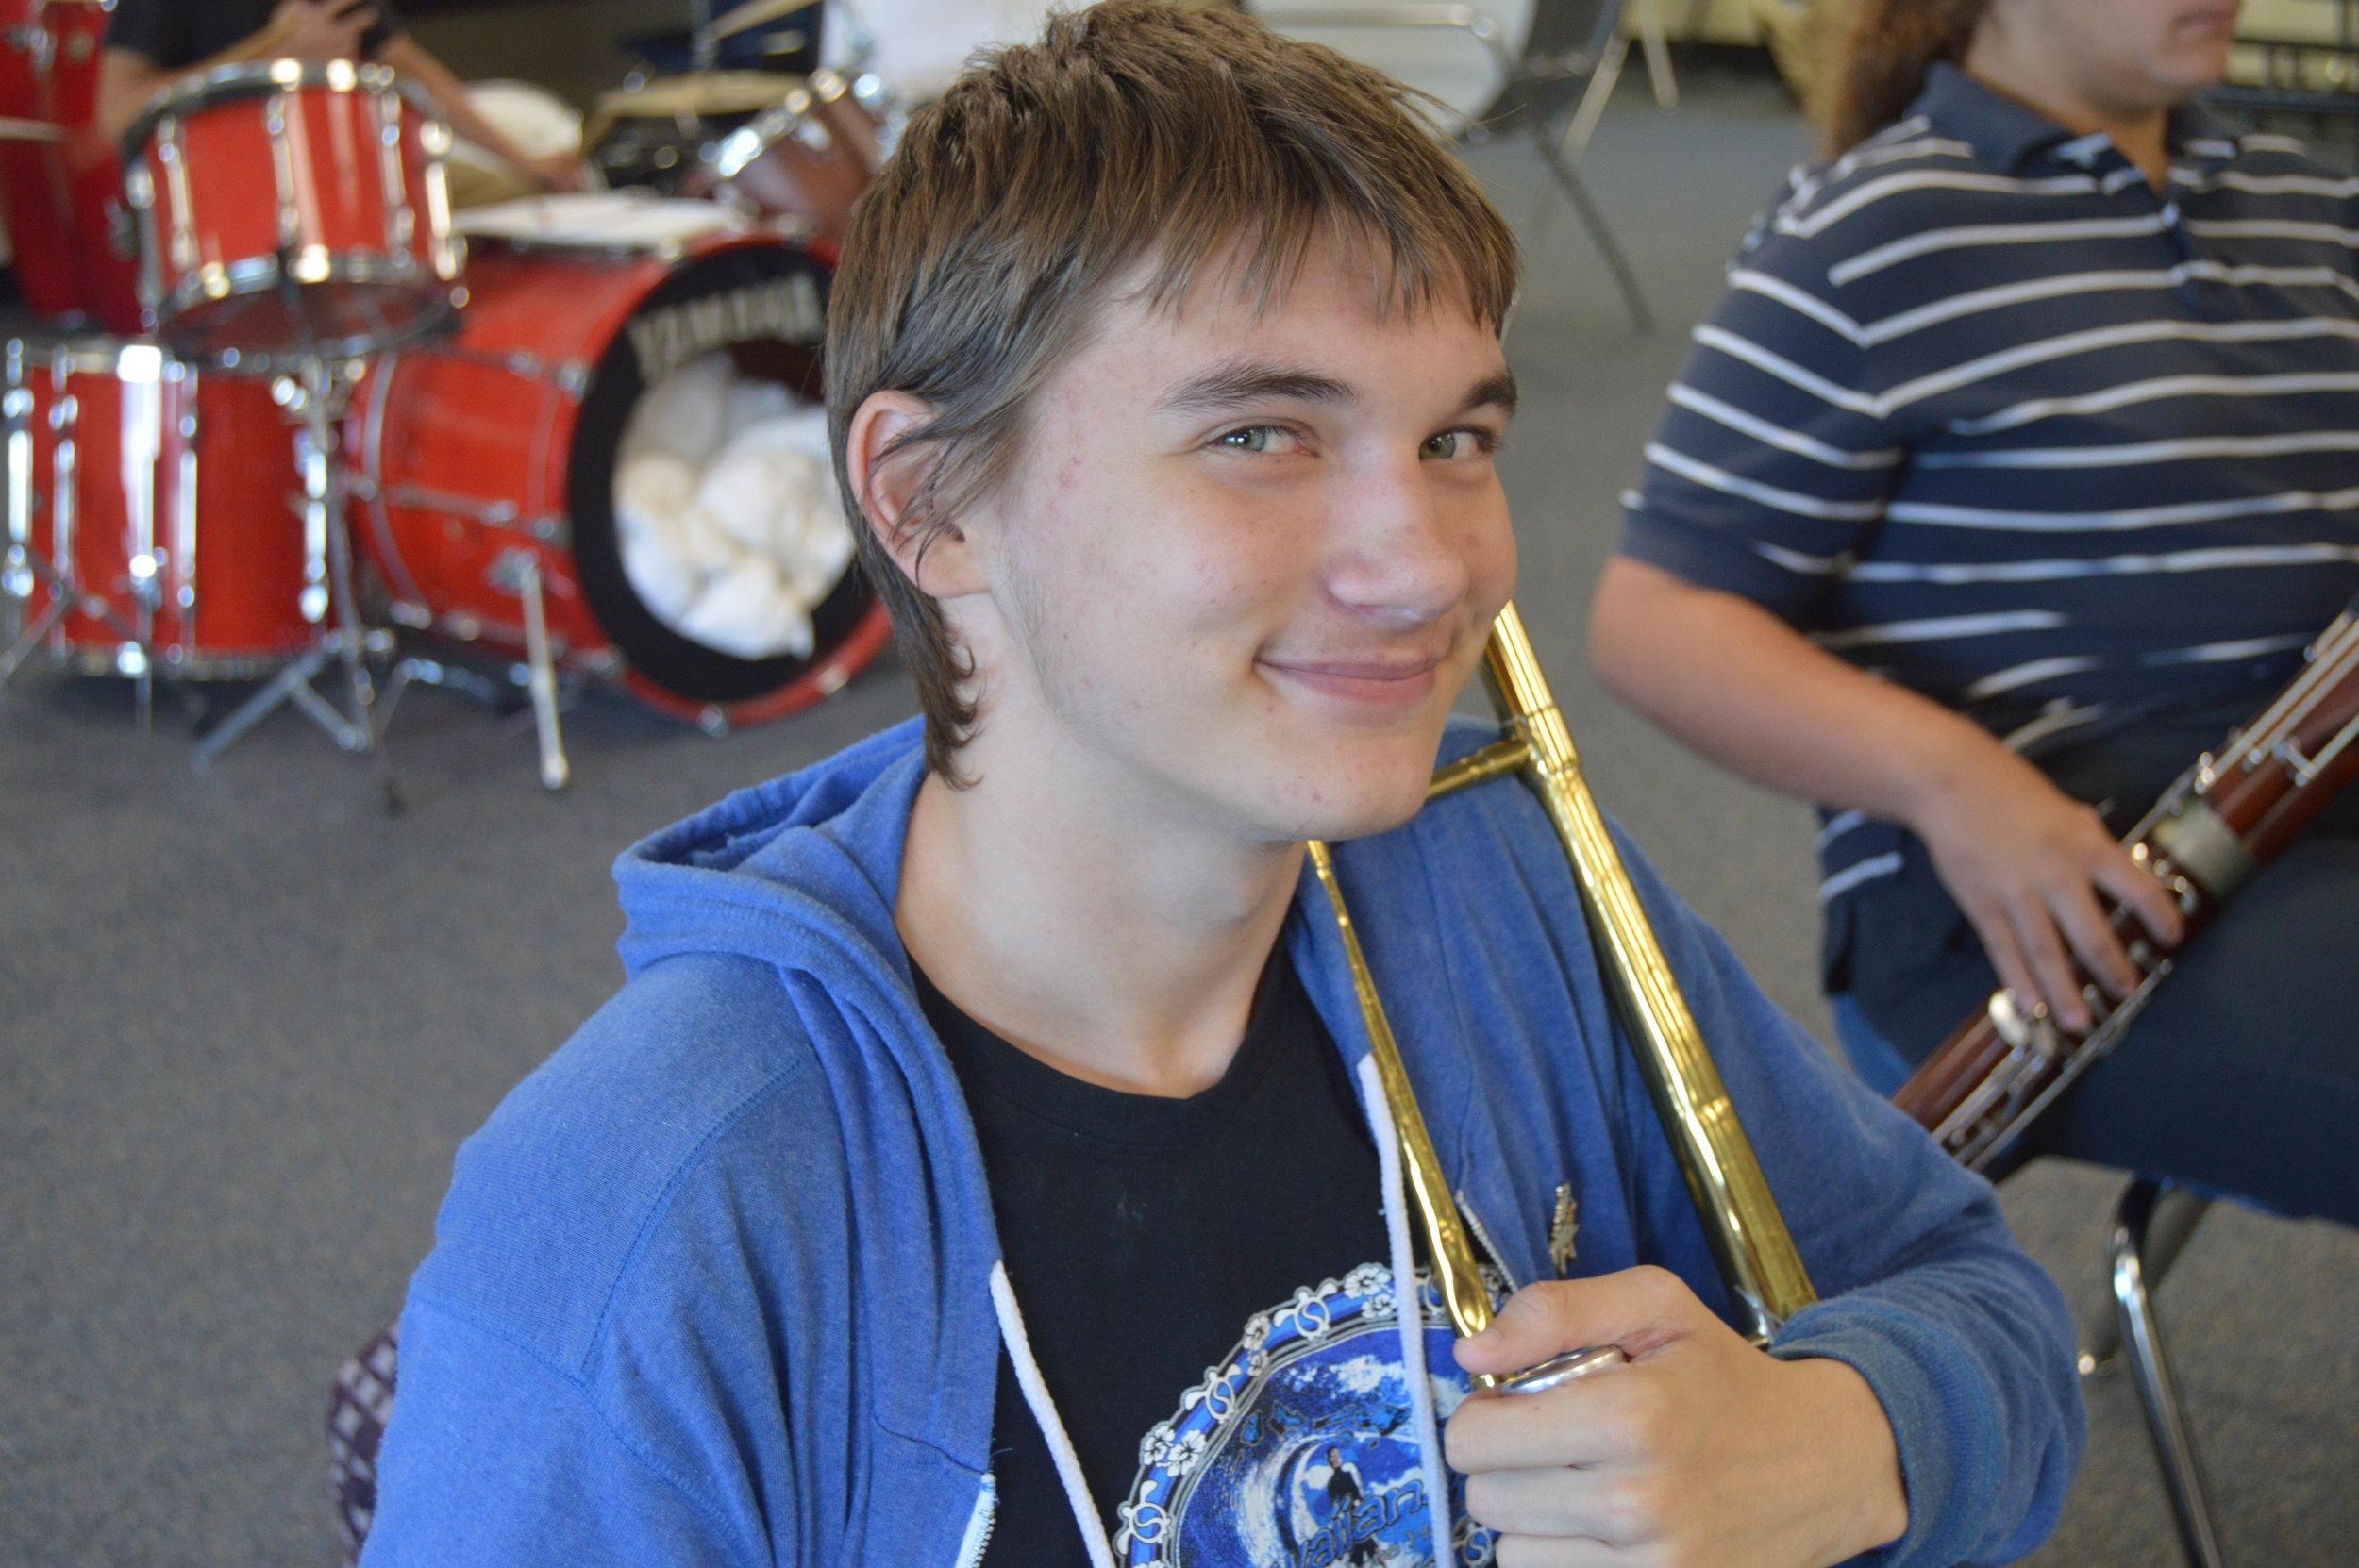 Student Trombone Player